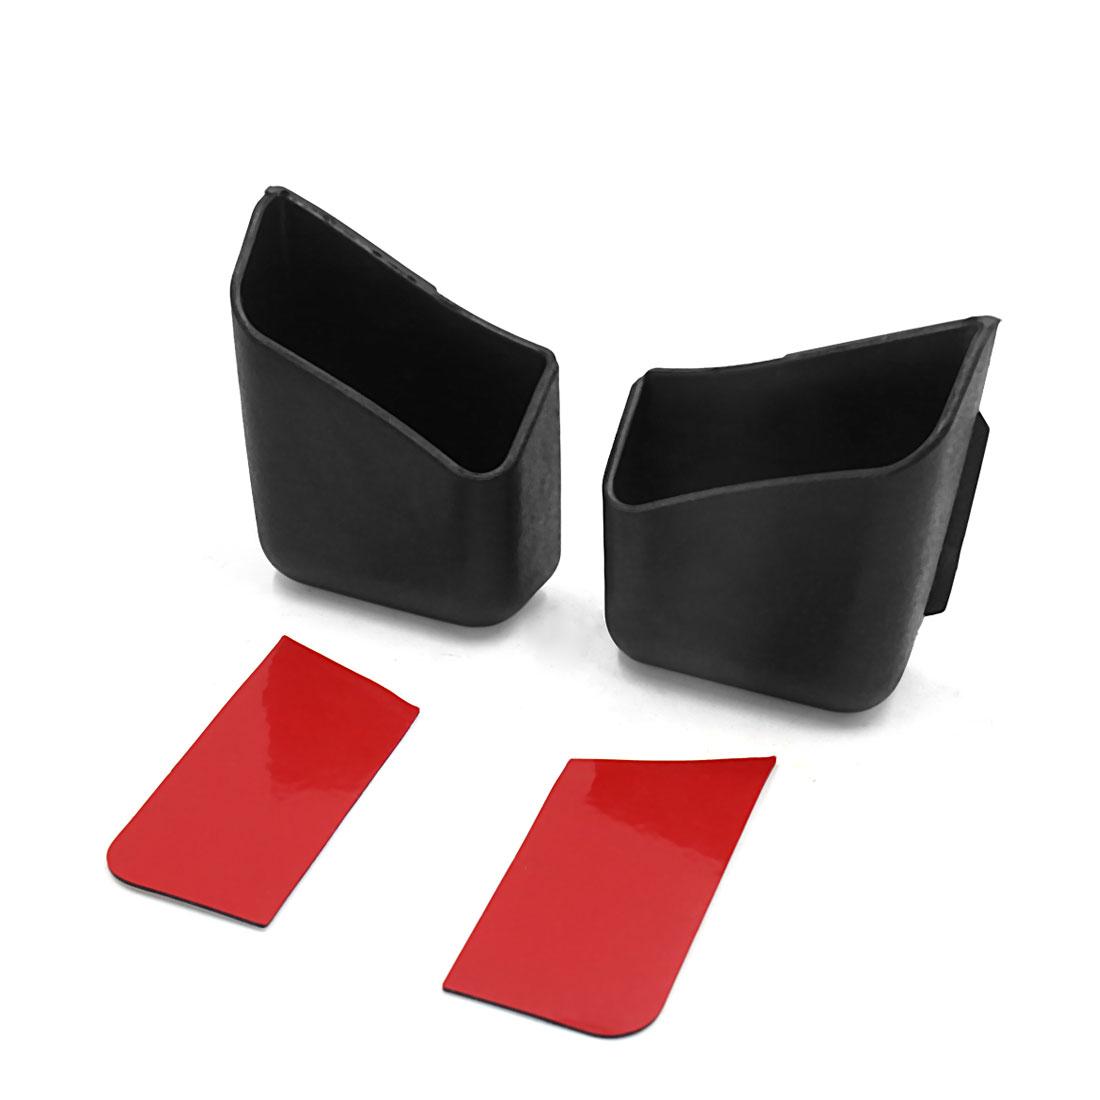 2Pcs Plastic Adhesive Car Storage Box Phone Charge Bag Holder Organizer Black